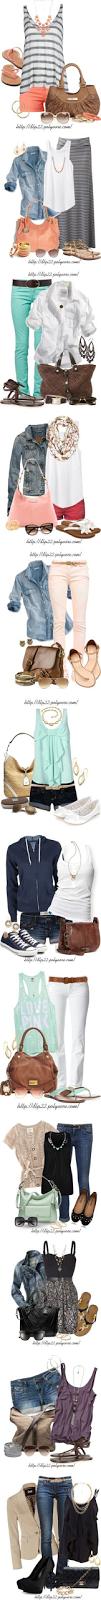 Spring Summer Clothes